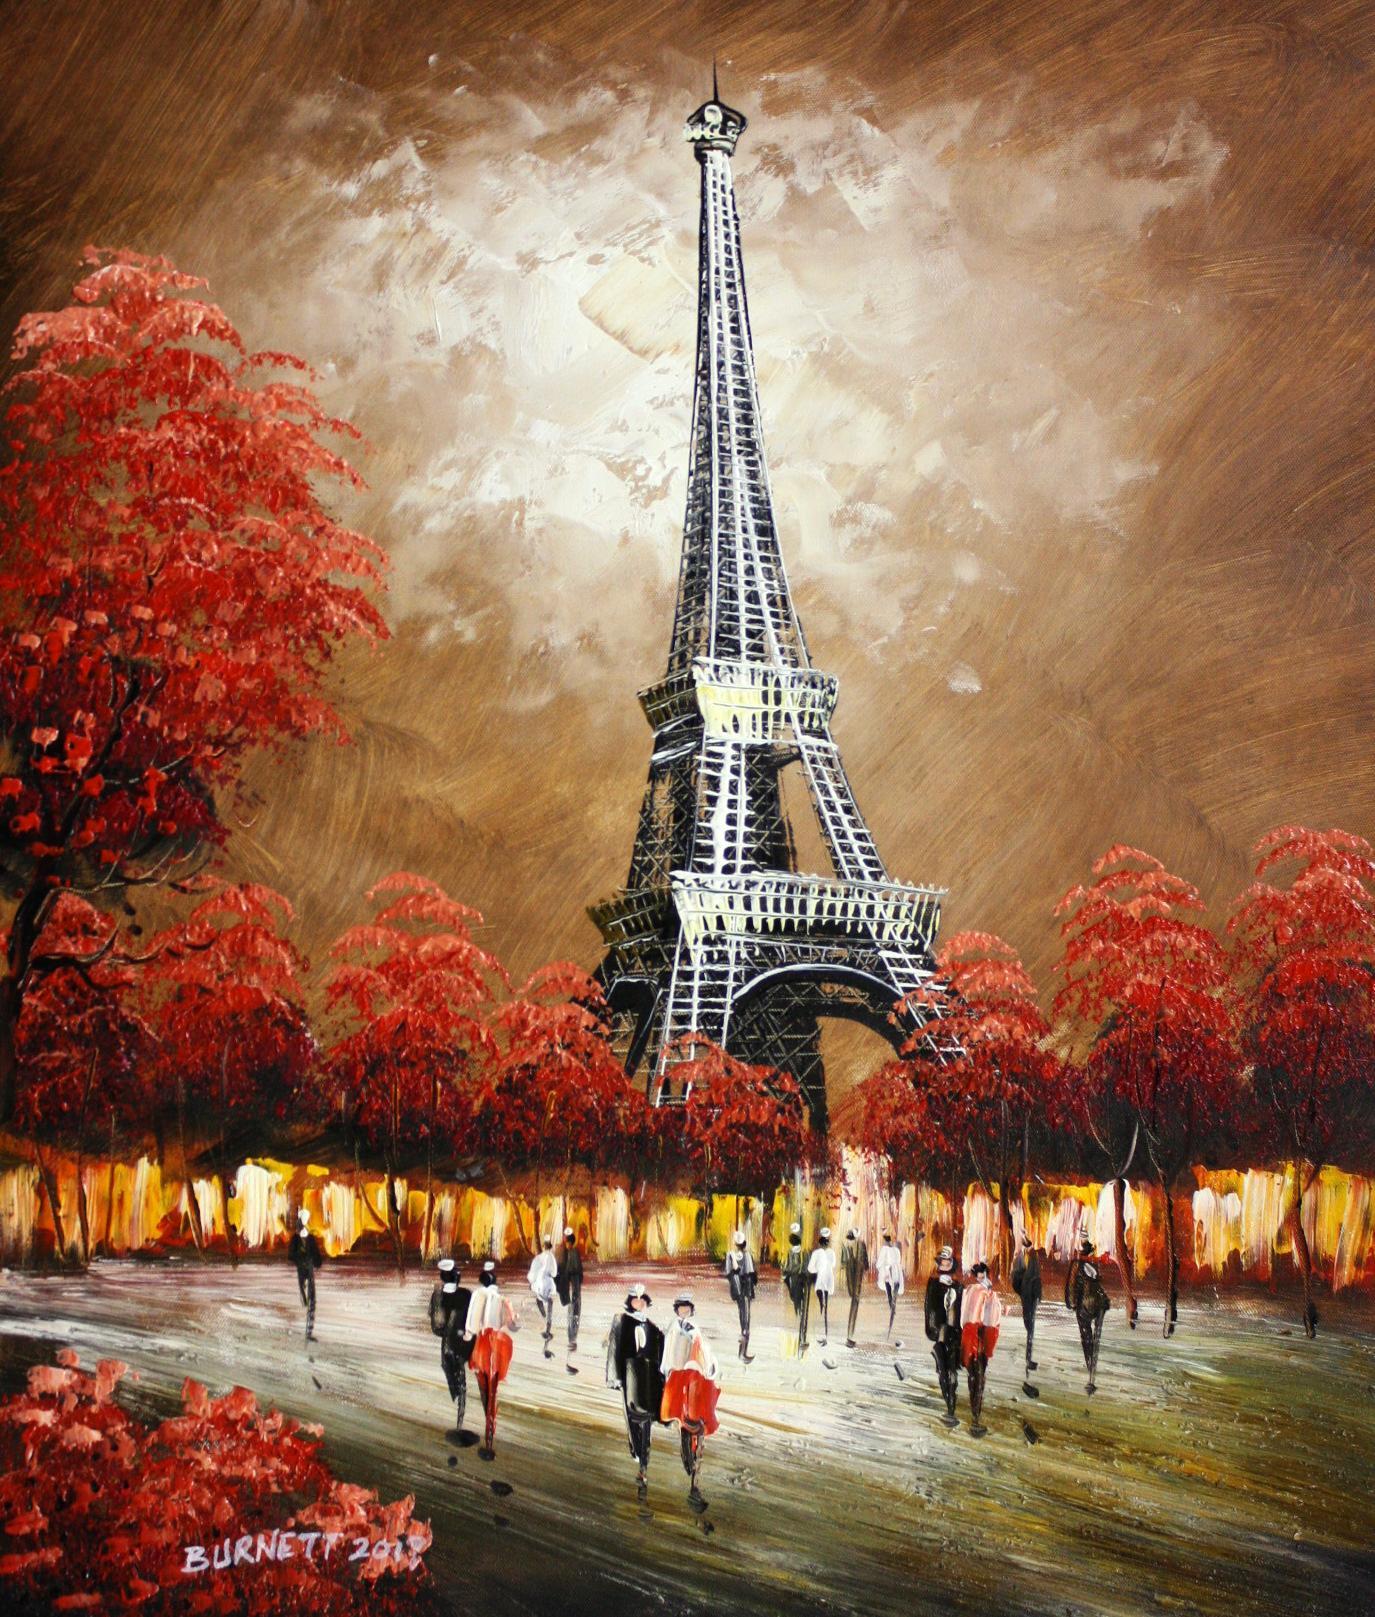 Modern Art Spaziergang am Eiffelturm c94367 50x60cm Ölgemälde handgemalt